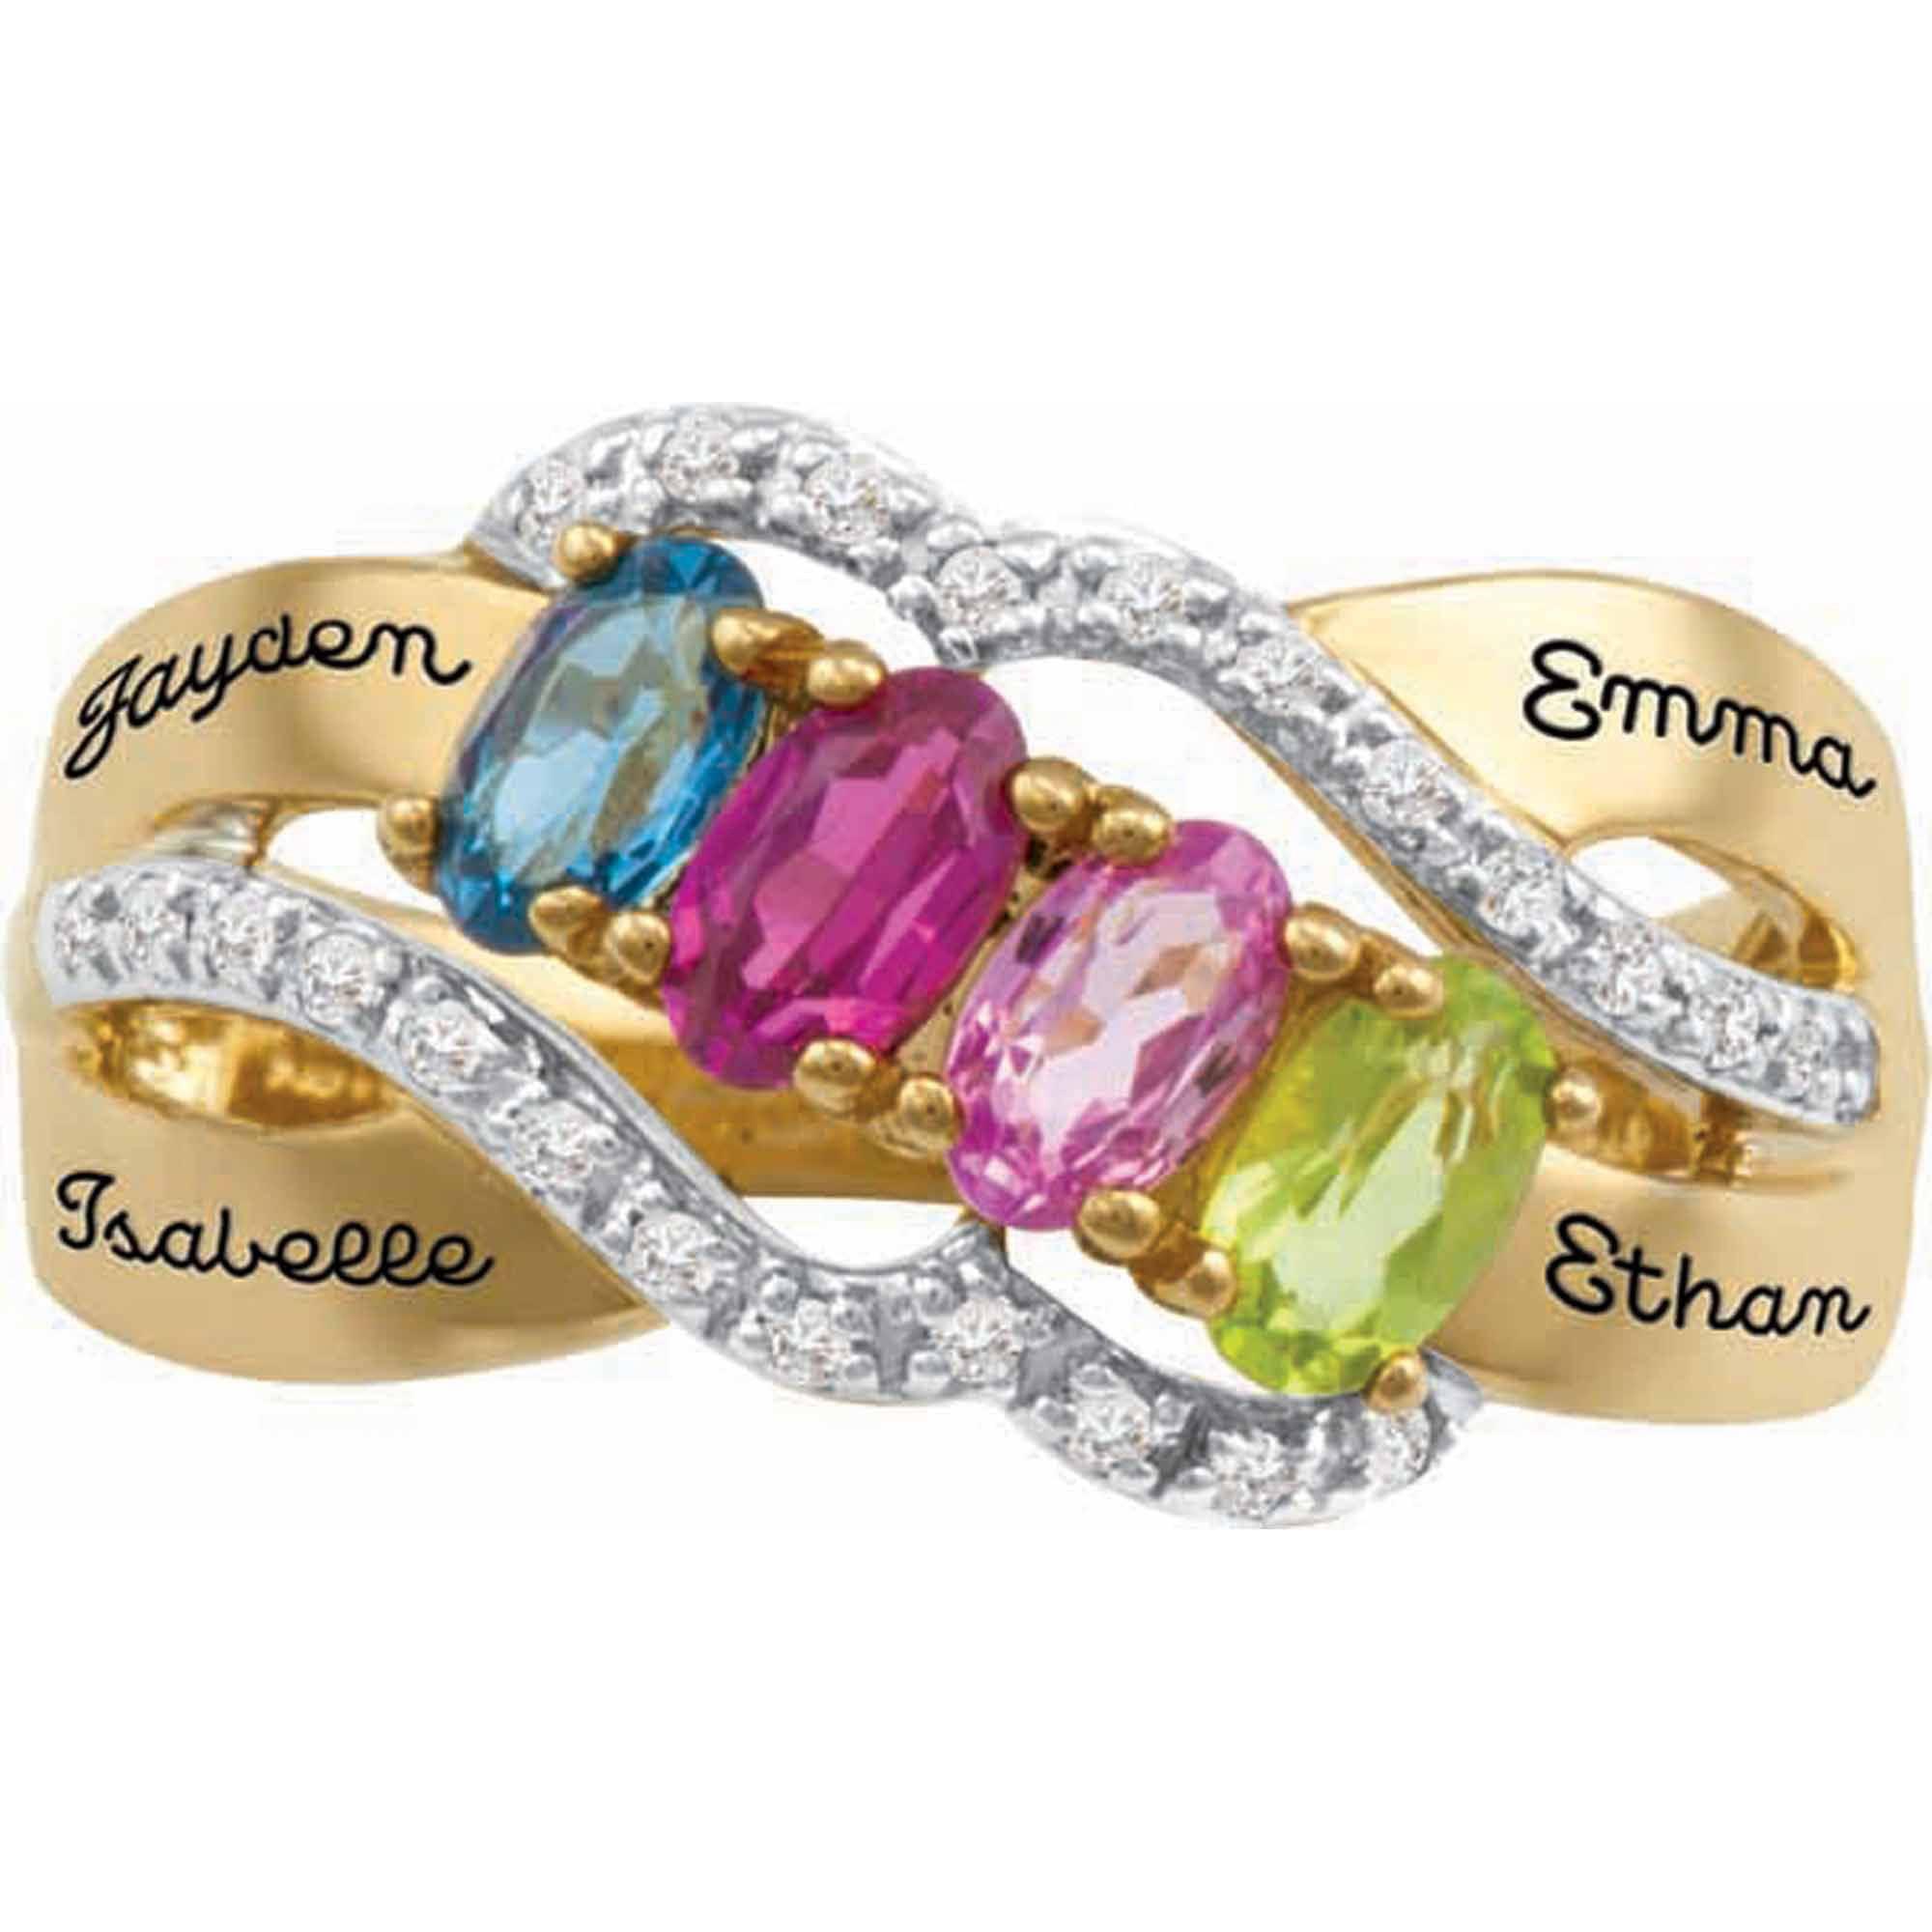 Personalized Keepsake Fondness Ring